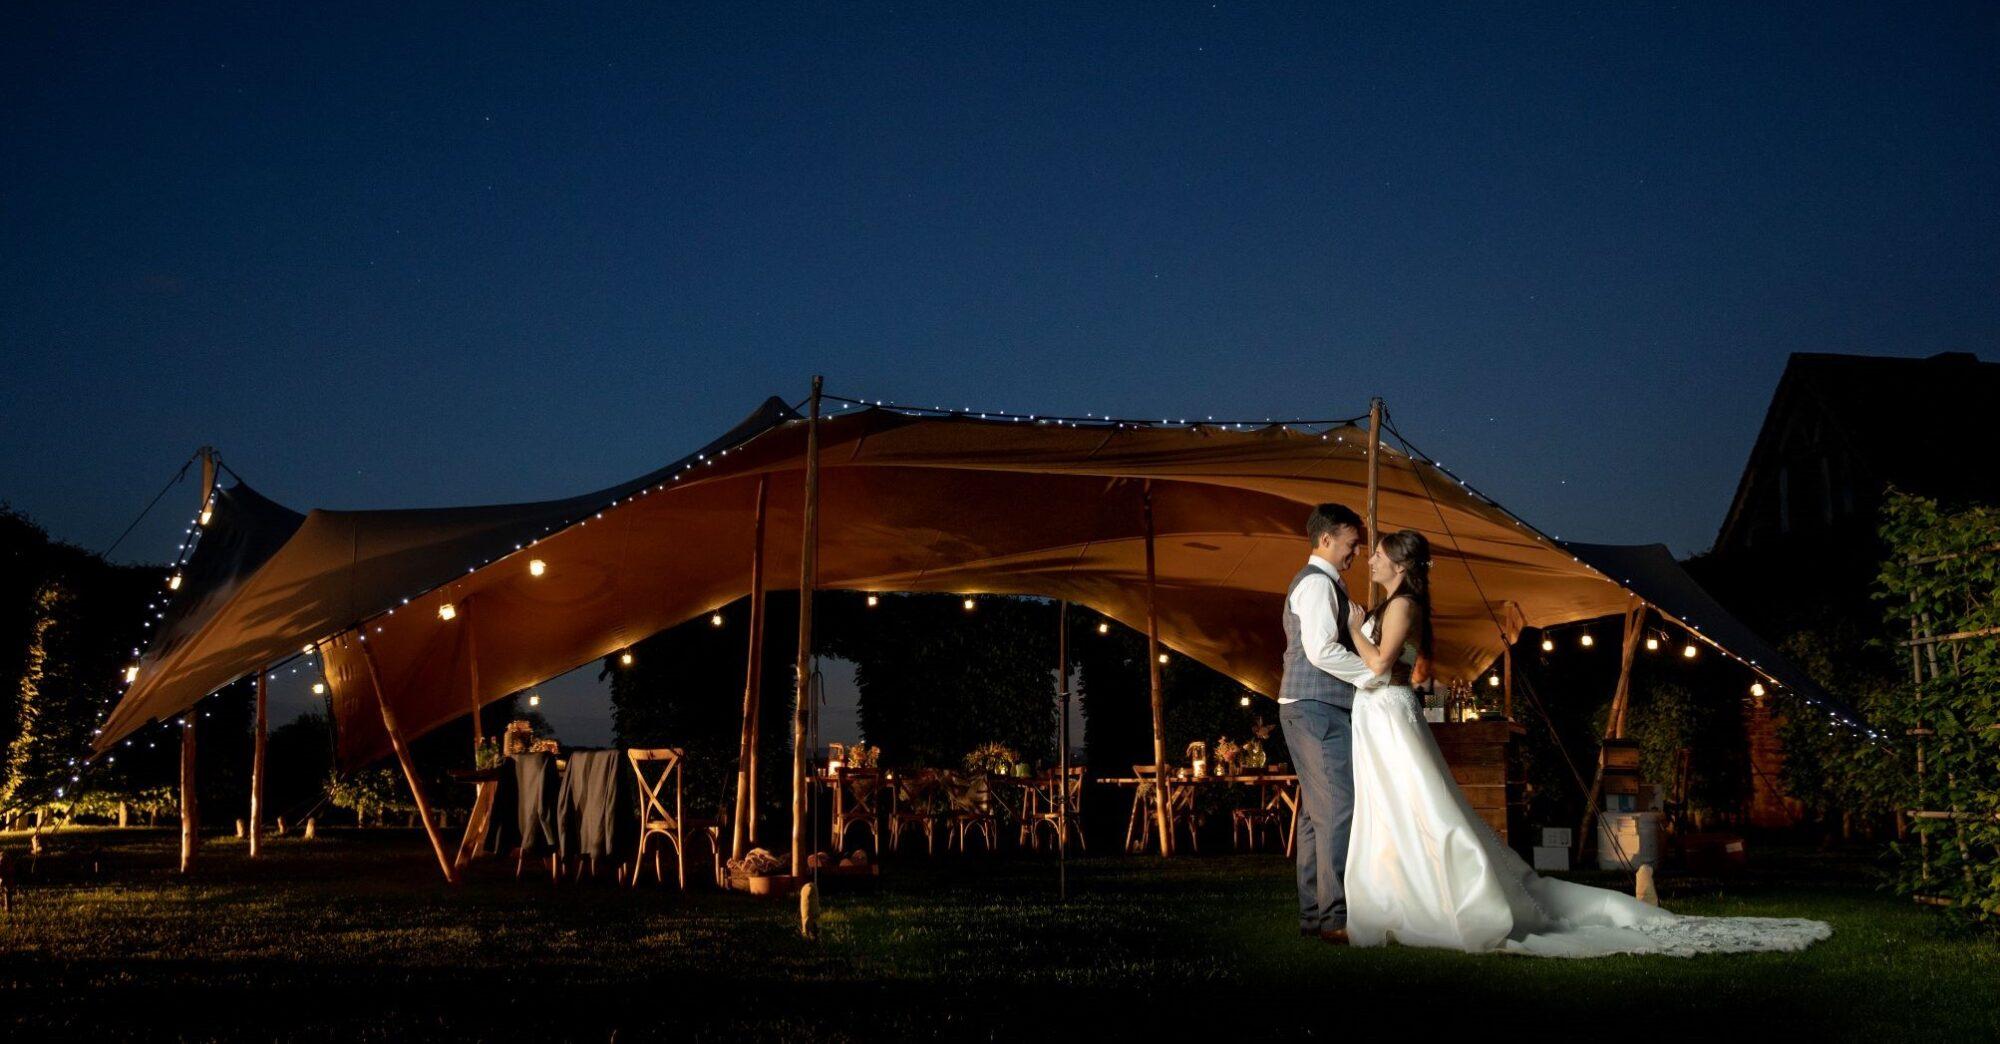 bride groom romantic twilight moment cotswolds wedding venue oxford wedding photography